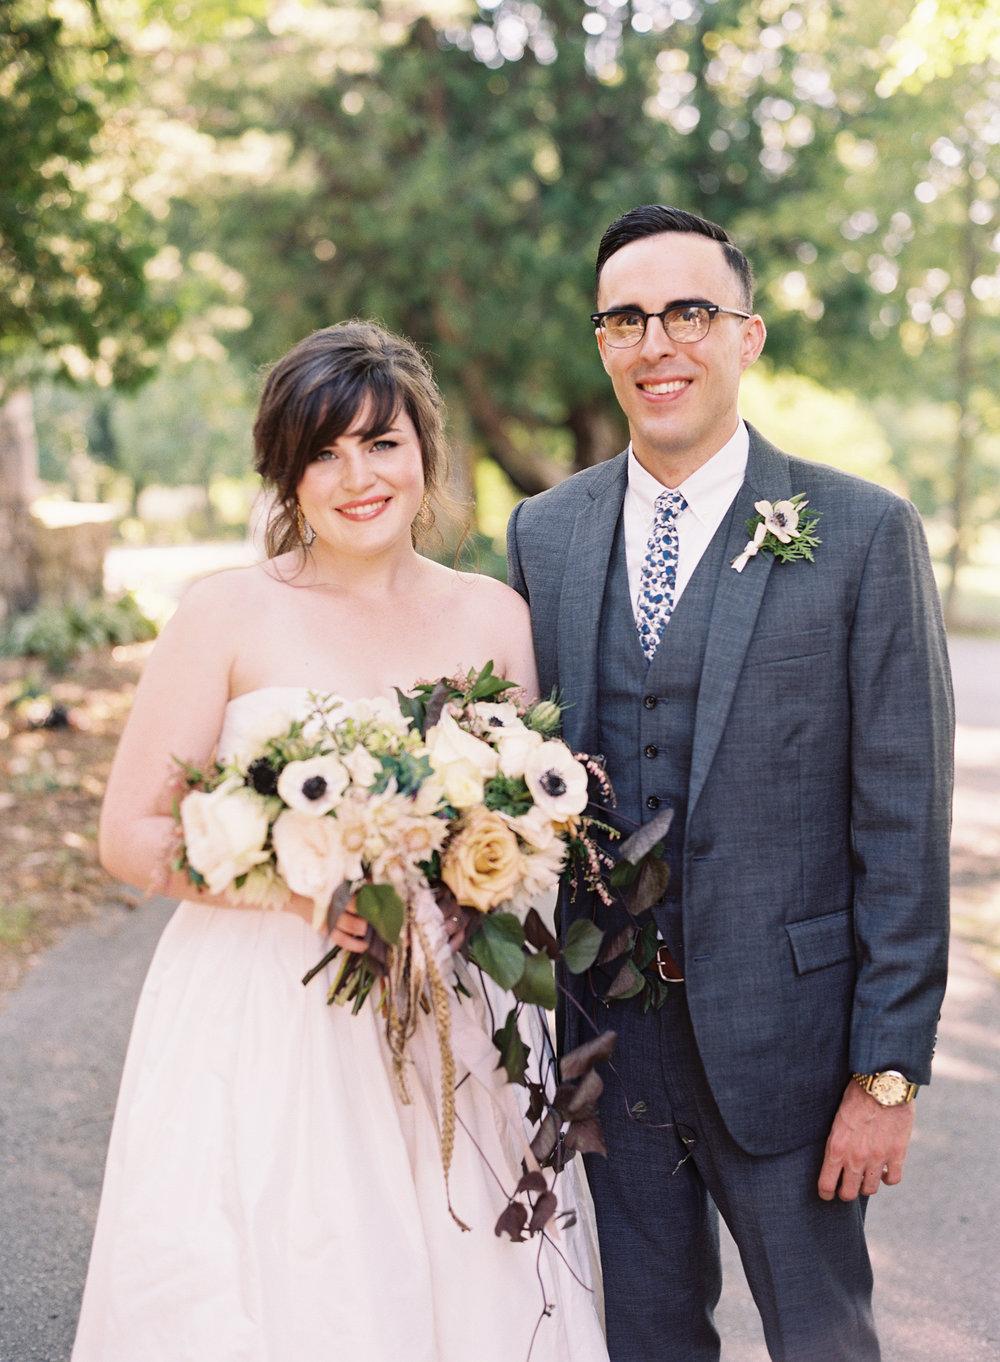 mallory joyce wedding planner florist